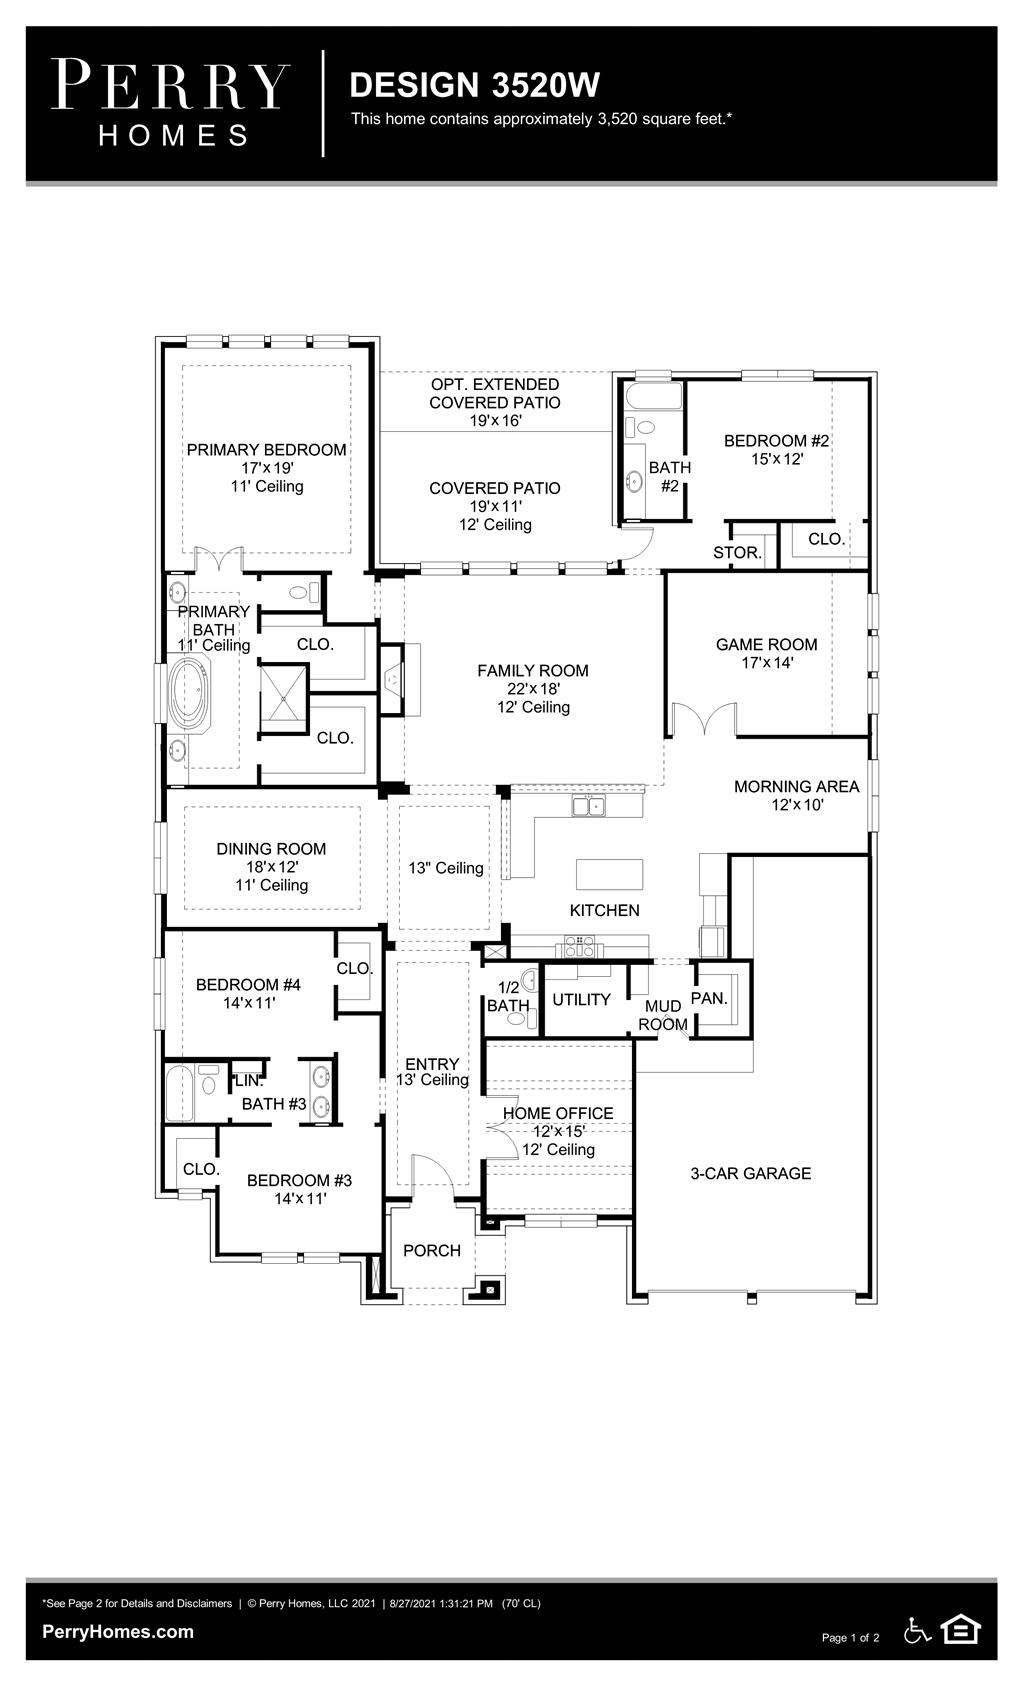 Floor Plan for 3520W